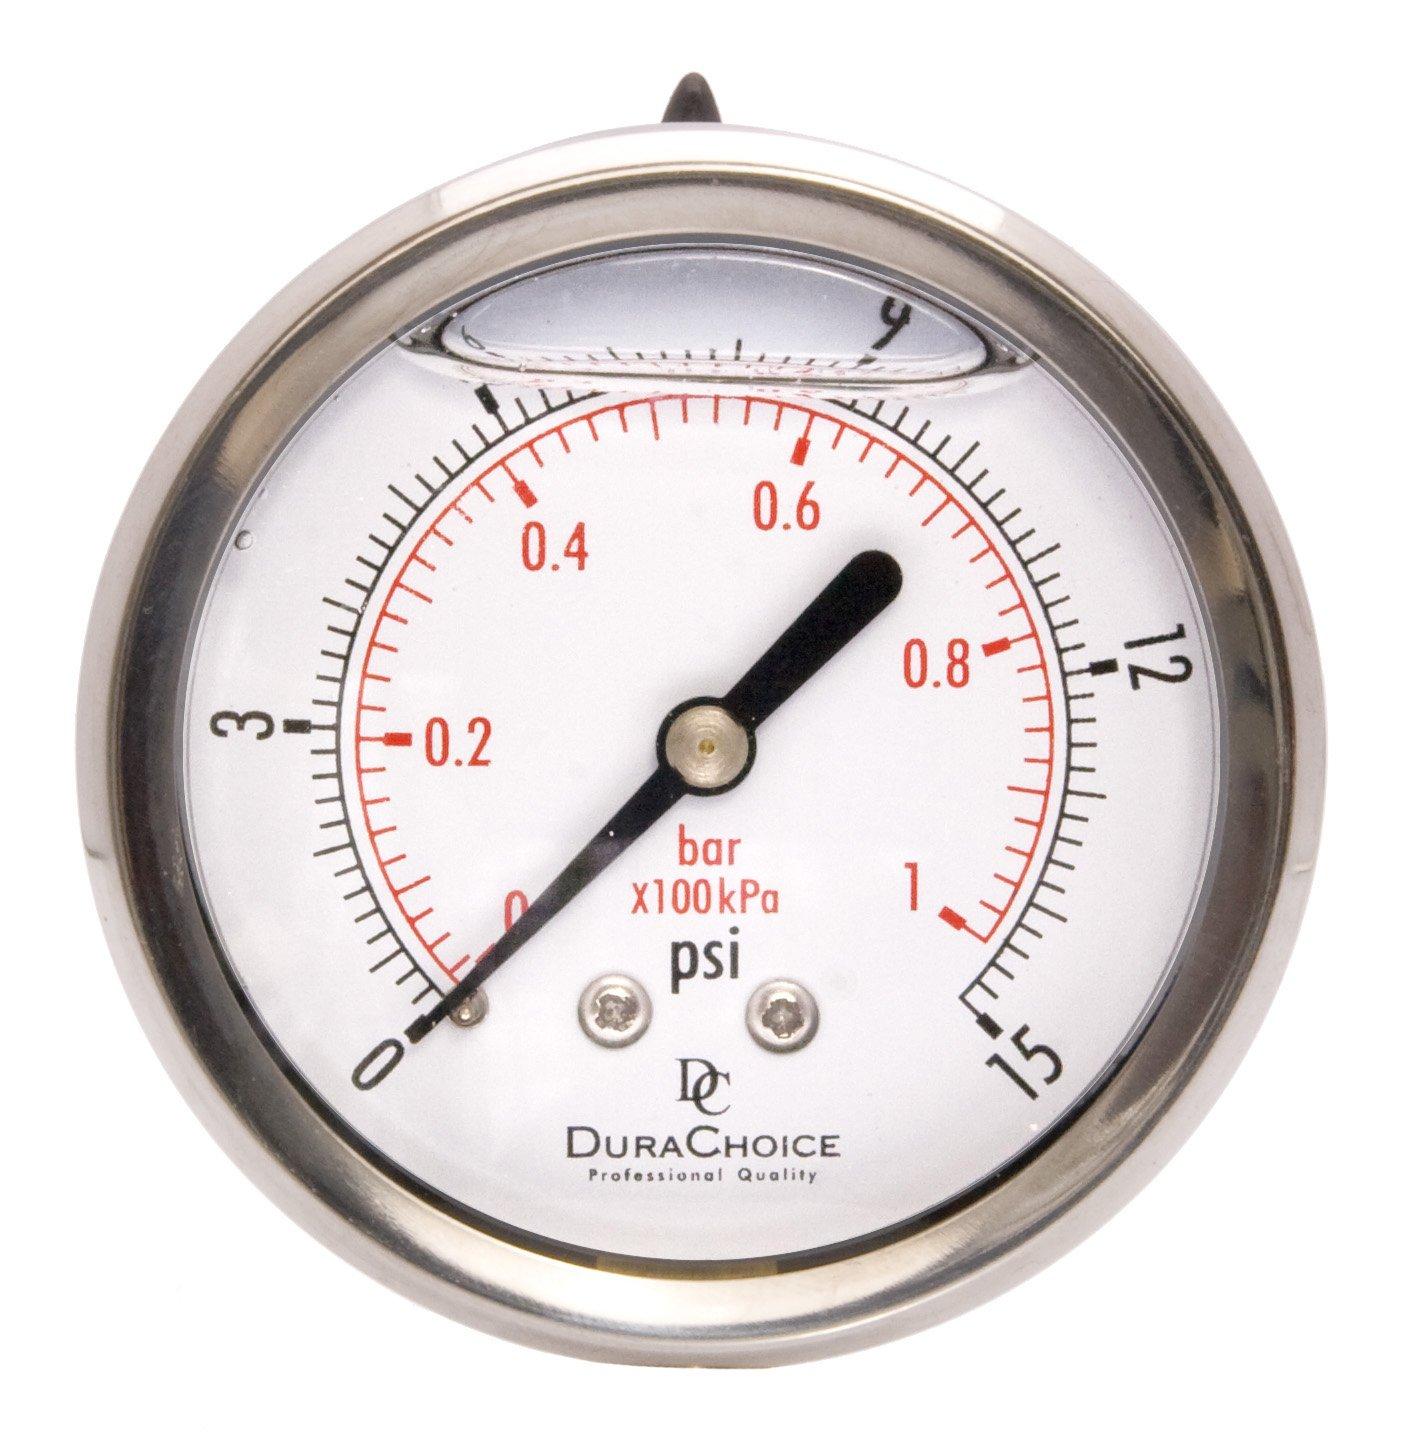 2-1/2'' Liquid Filled Pressure Gauges - Stainless Steel Case, Brass, 1/4'' NPT, Center Back Mount Connection 0-15PSI